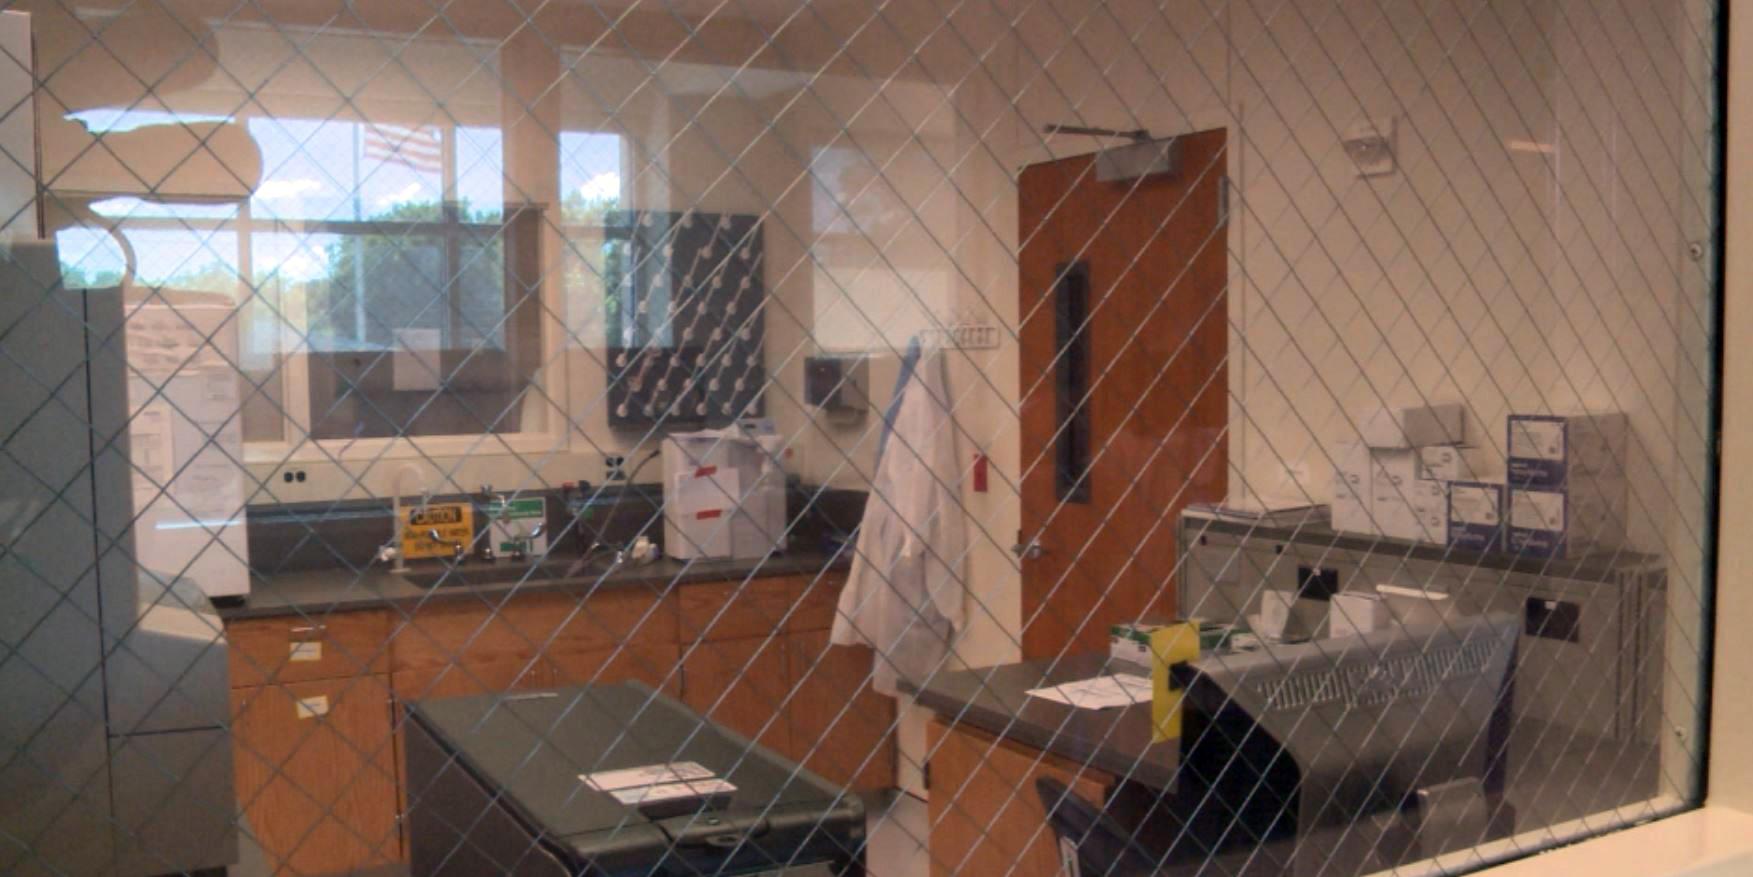 Austin Police Department APD DNA Lab_298747